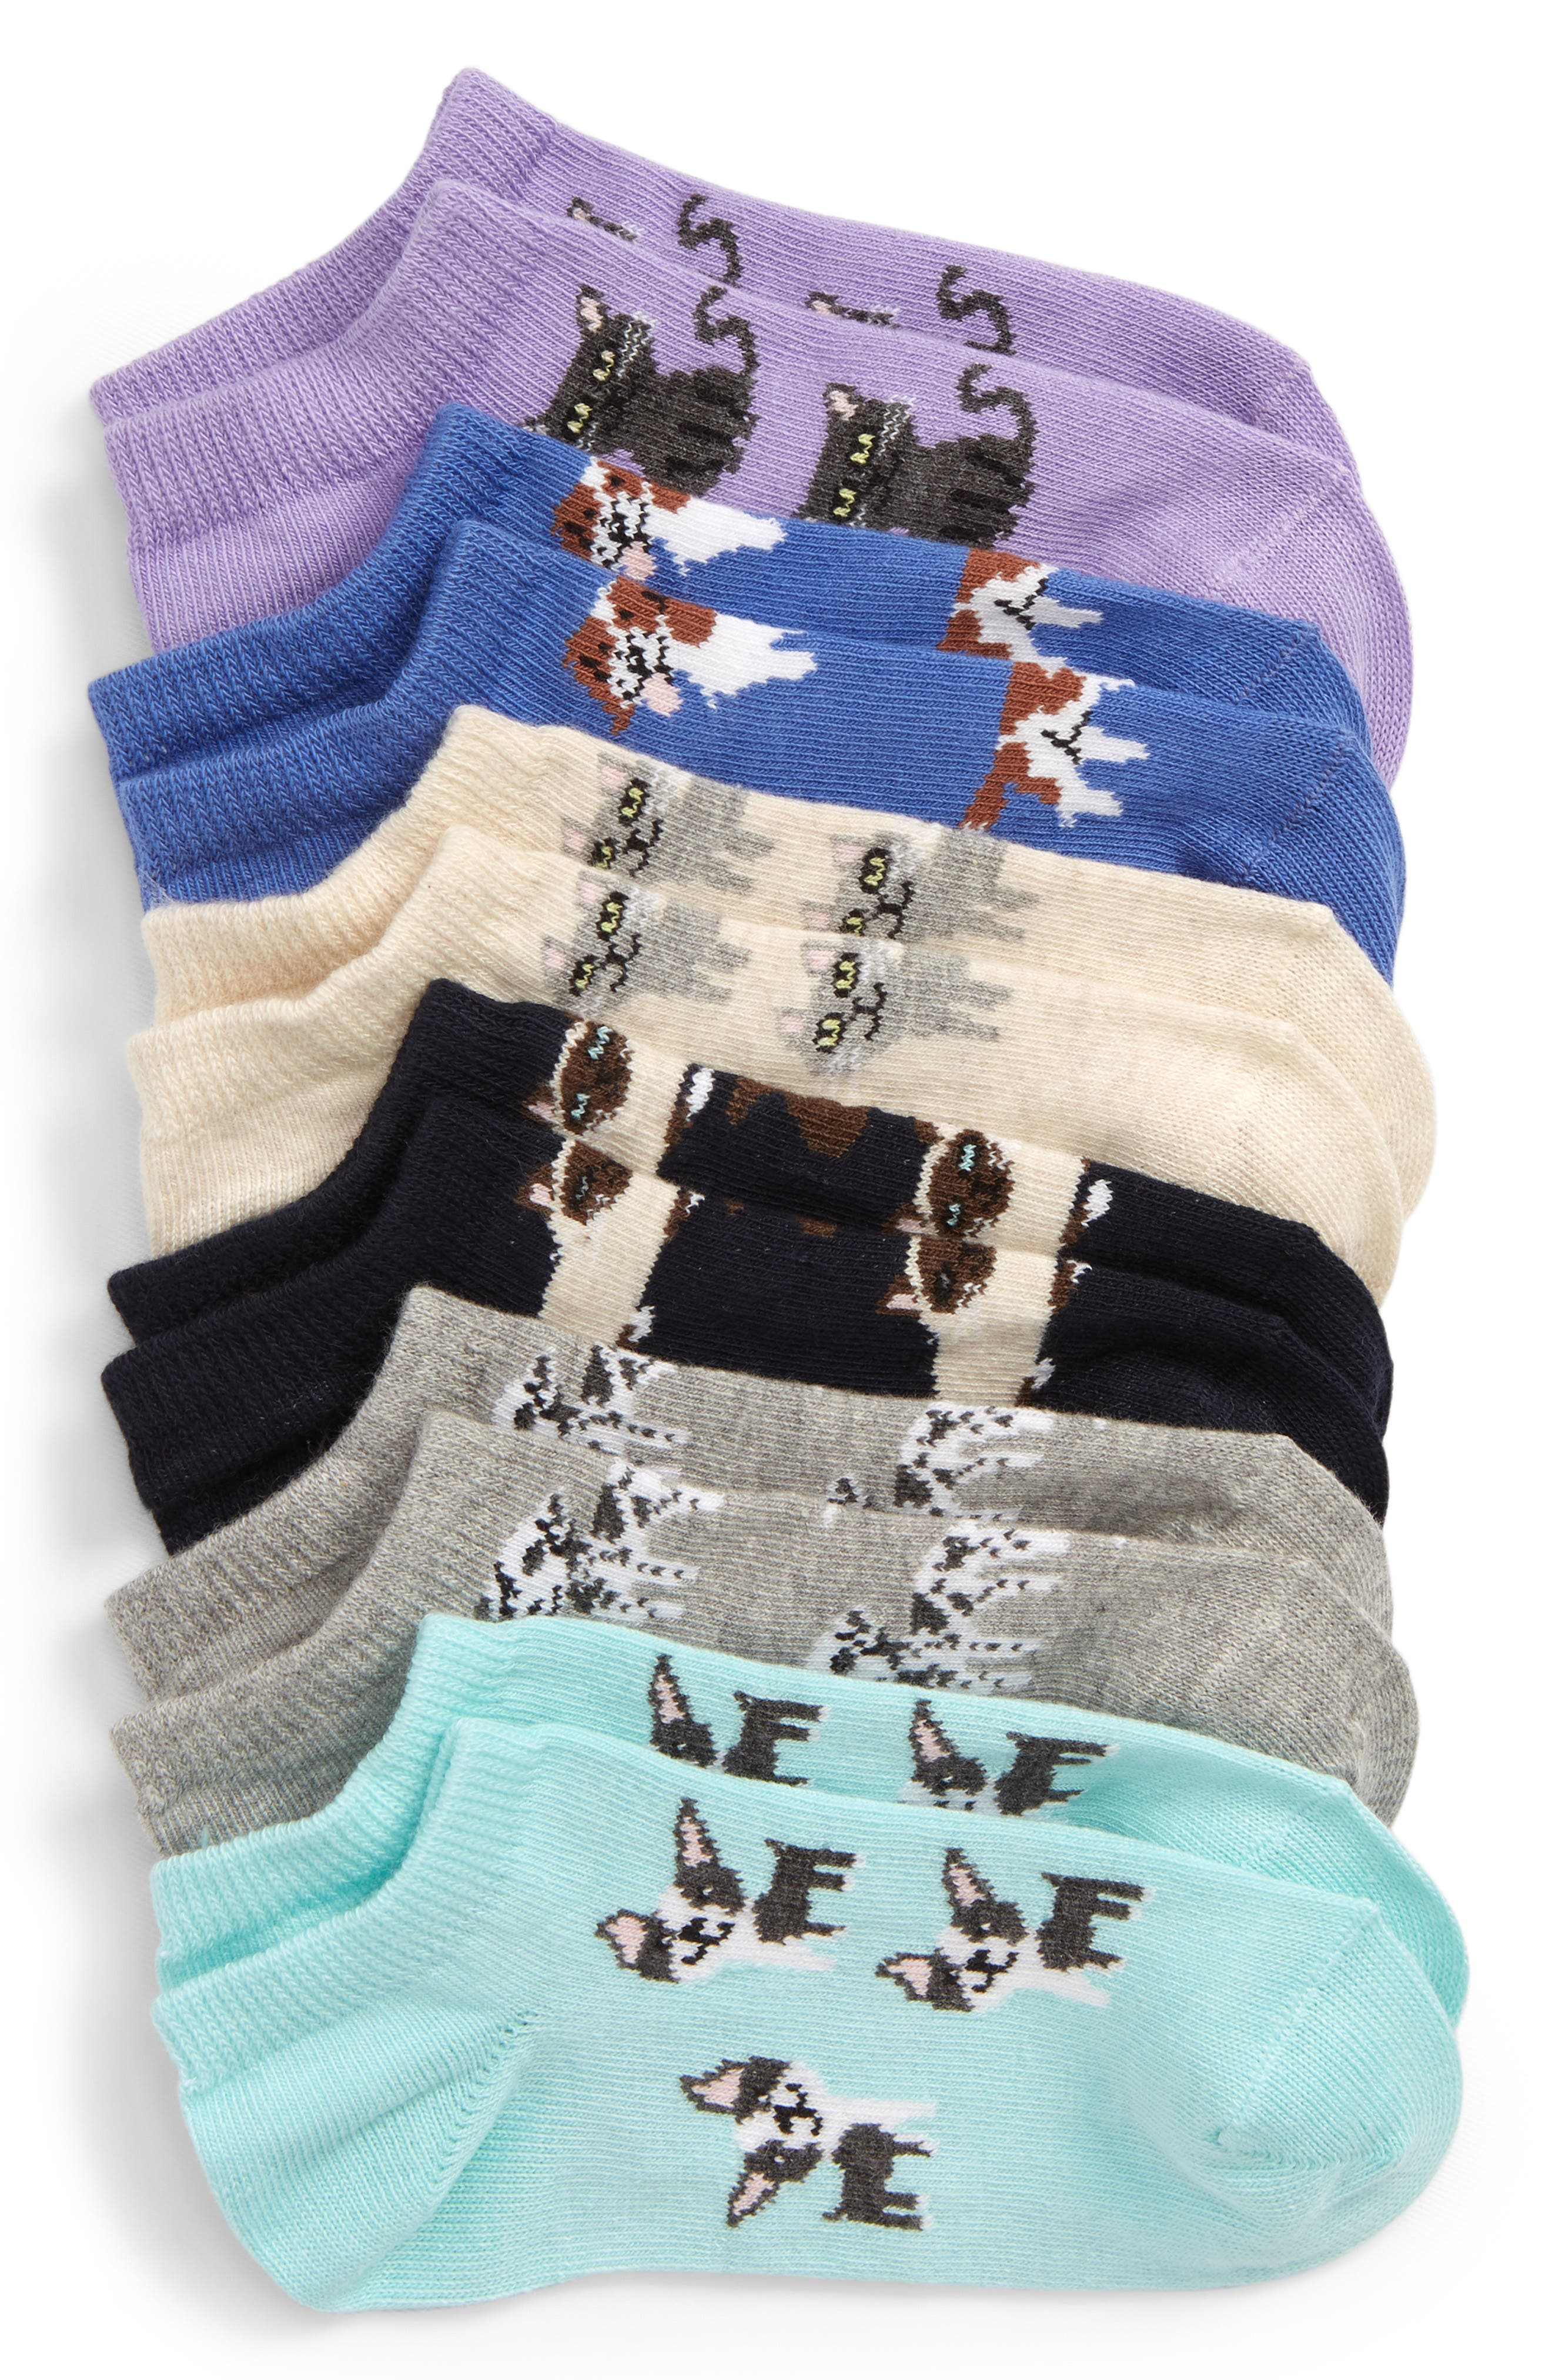 TUCKER + TATE 6-Pack Low Cut Socks, Main, color, GREY MEDIUM HEATHER DALMATION